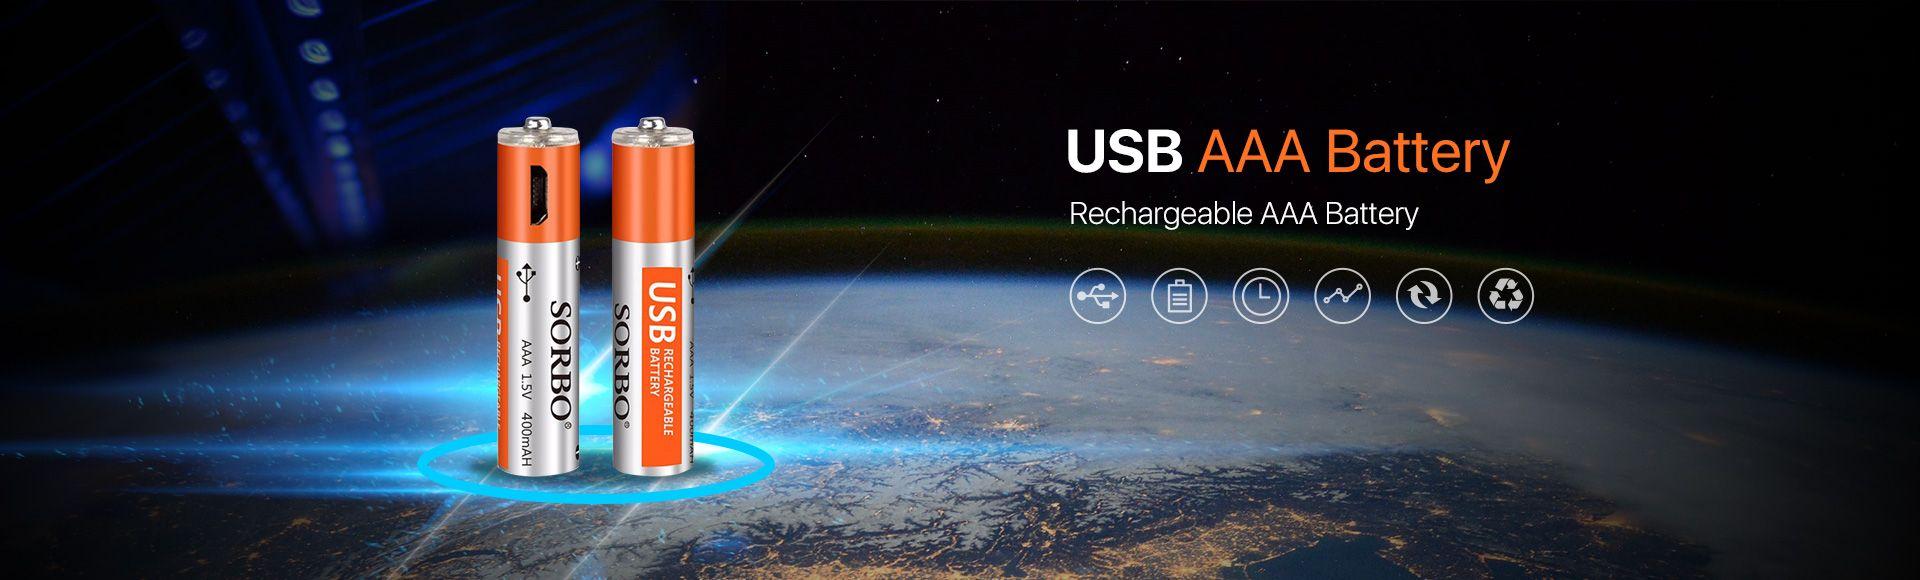 SORBO USB Rechargeable Lipo AAA Battery  - 1.5V 400mAh Micro USB Rechargeable 1 hour quick charging